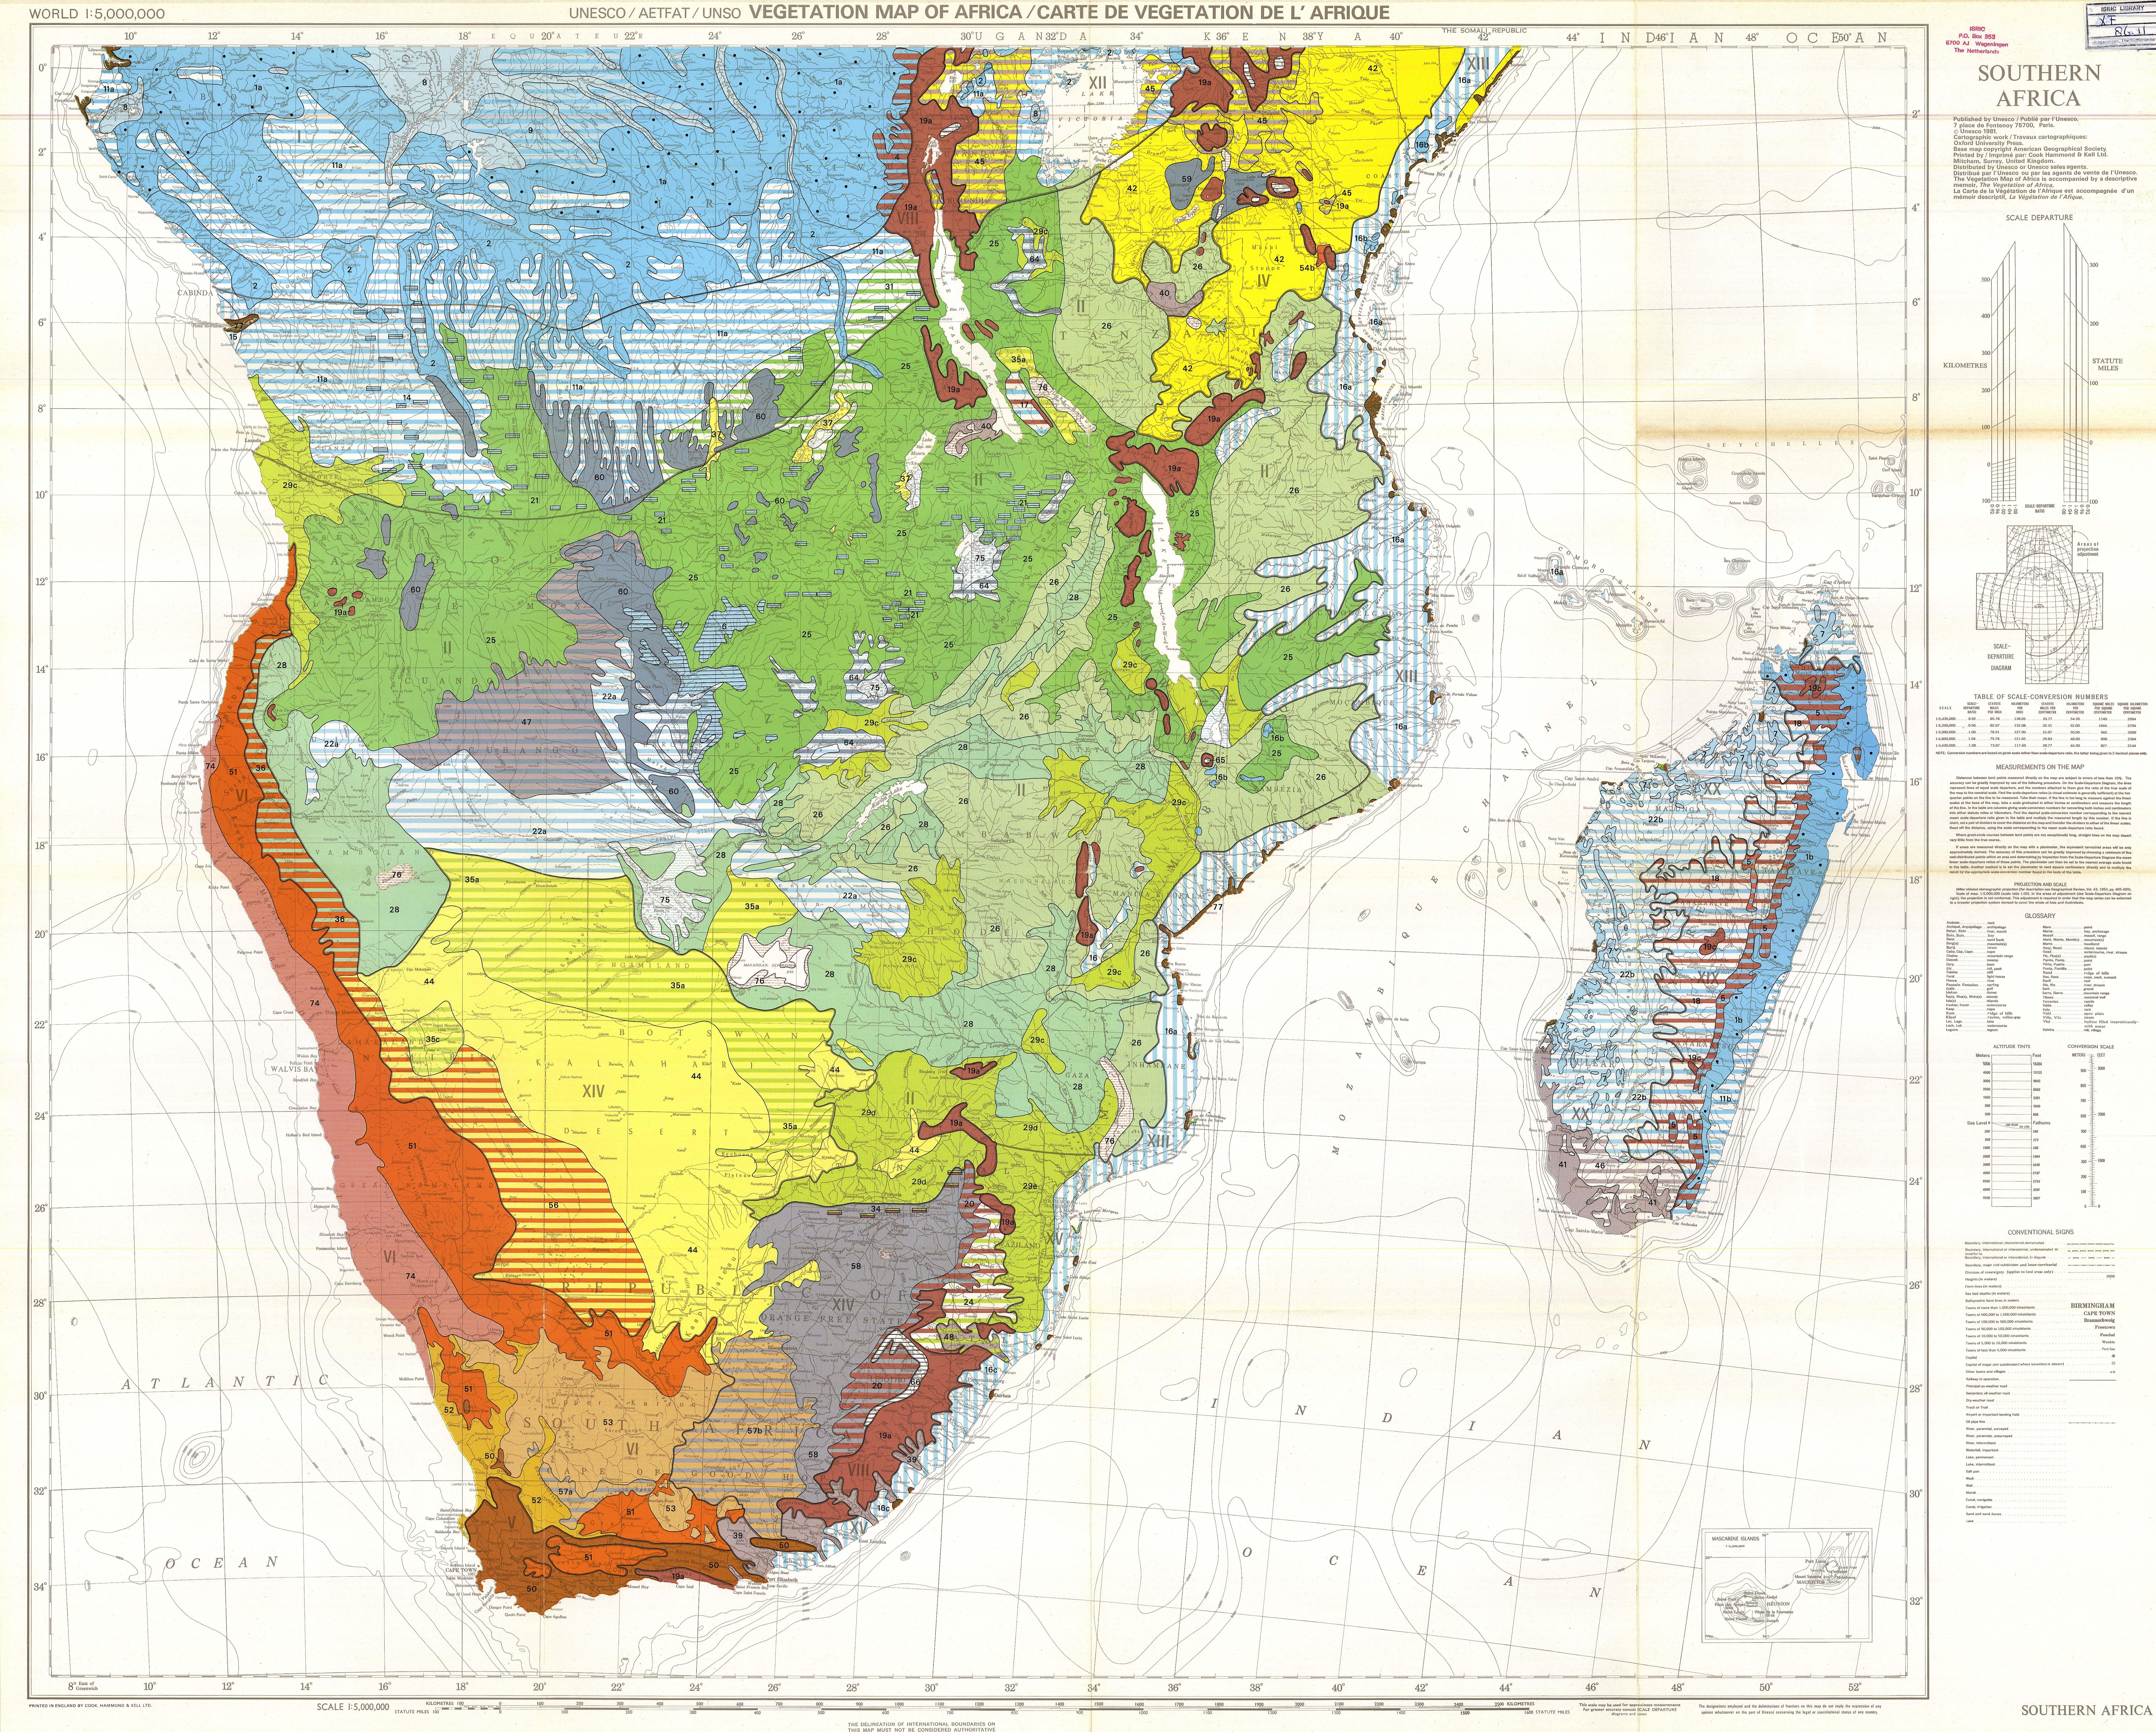 Vegetation map of africa southern africa carte de vegetation de l download gumiabroncs Image collections